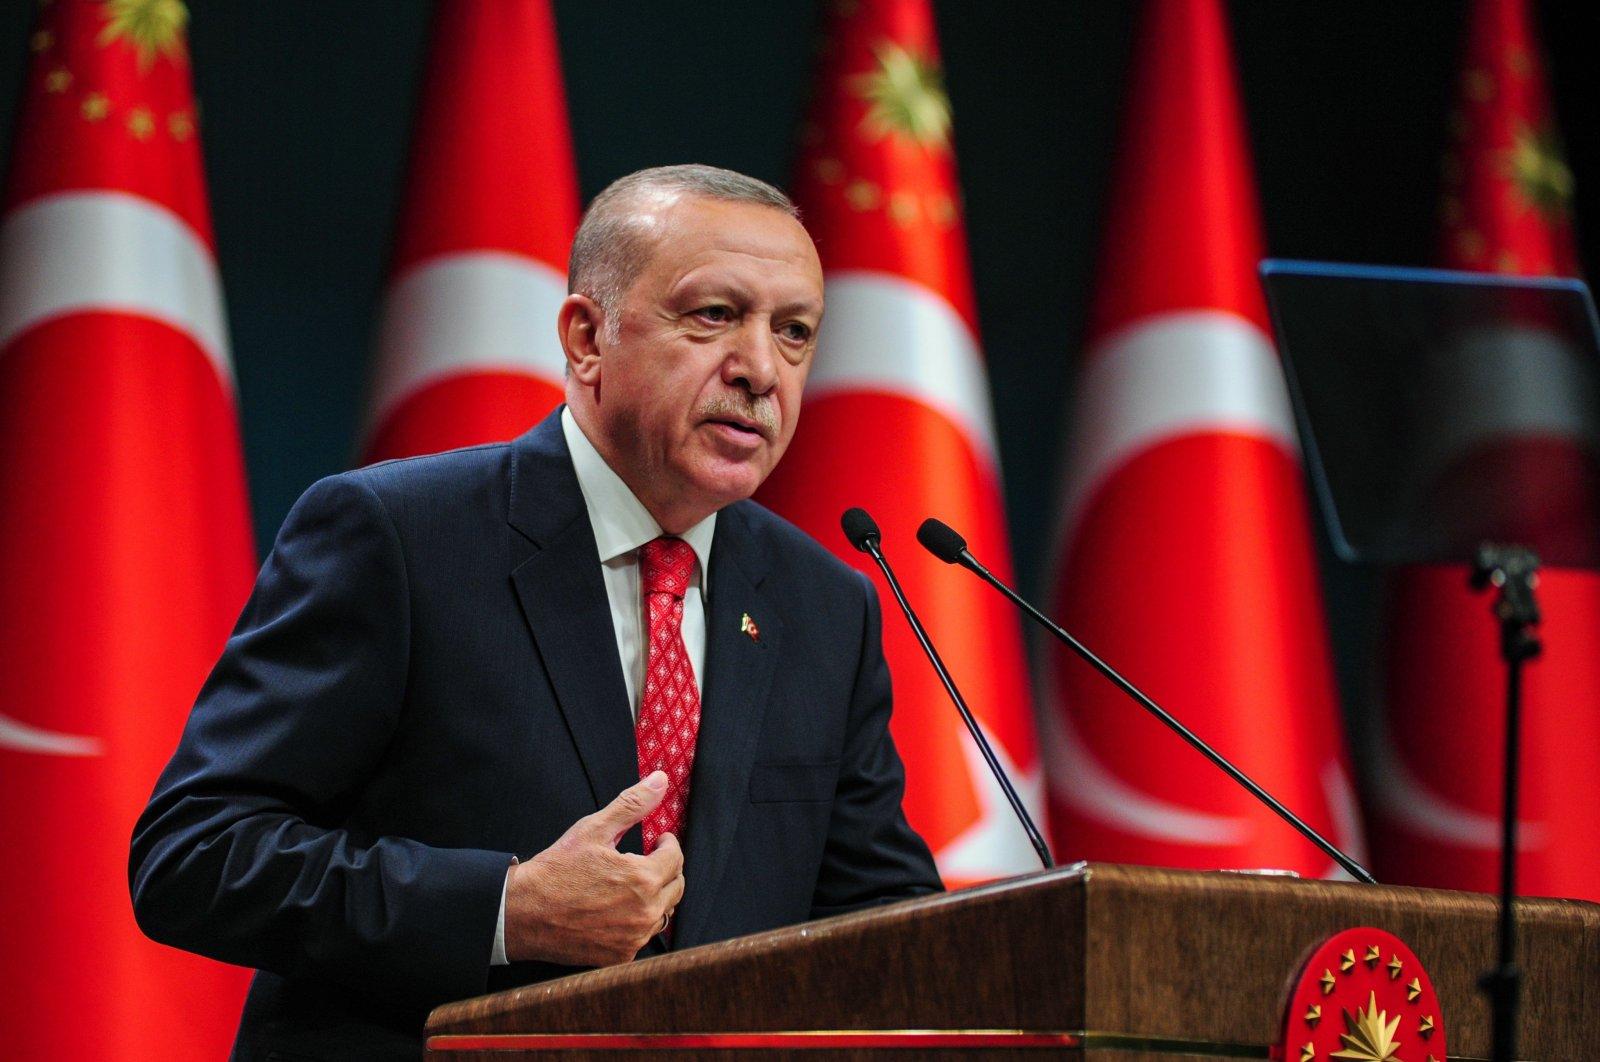 President Recep Tayyip Erdoğan speaks after a Cabinet meeting, Ankara, Turkey, Aug. 10, 2020. (İHA Photo)